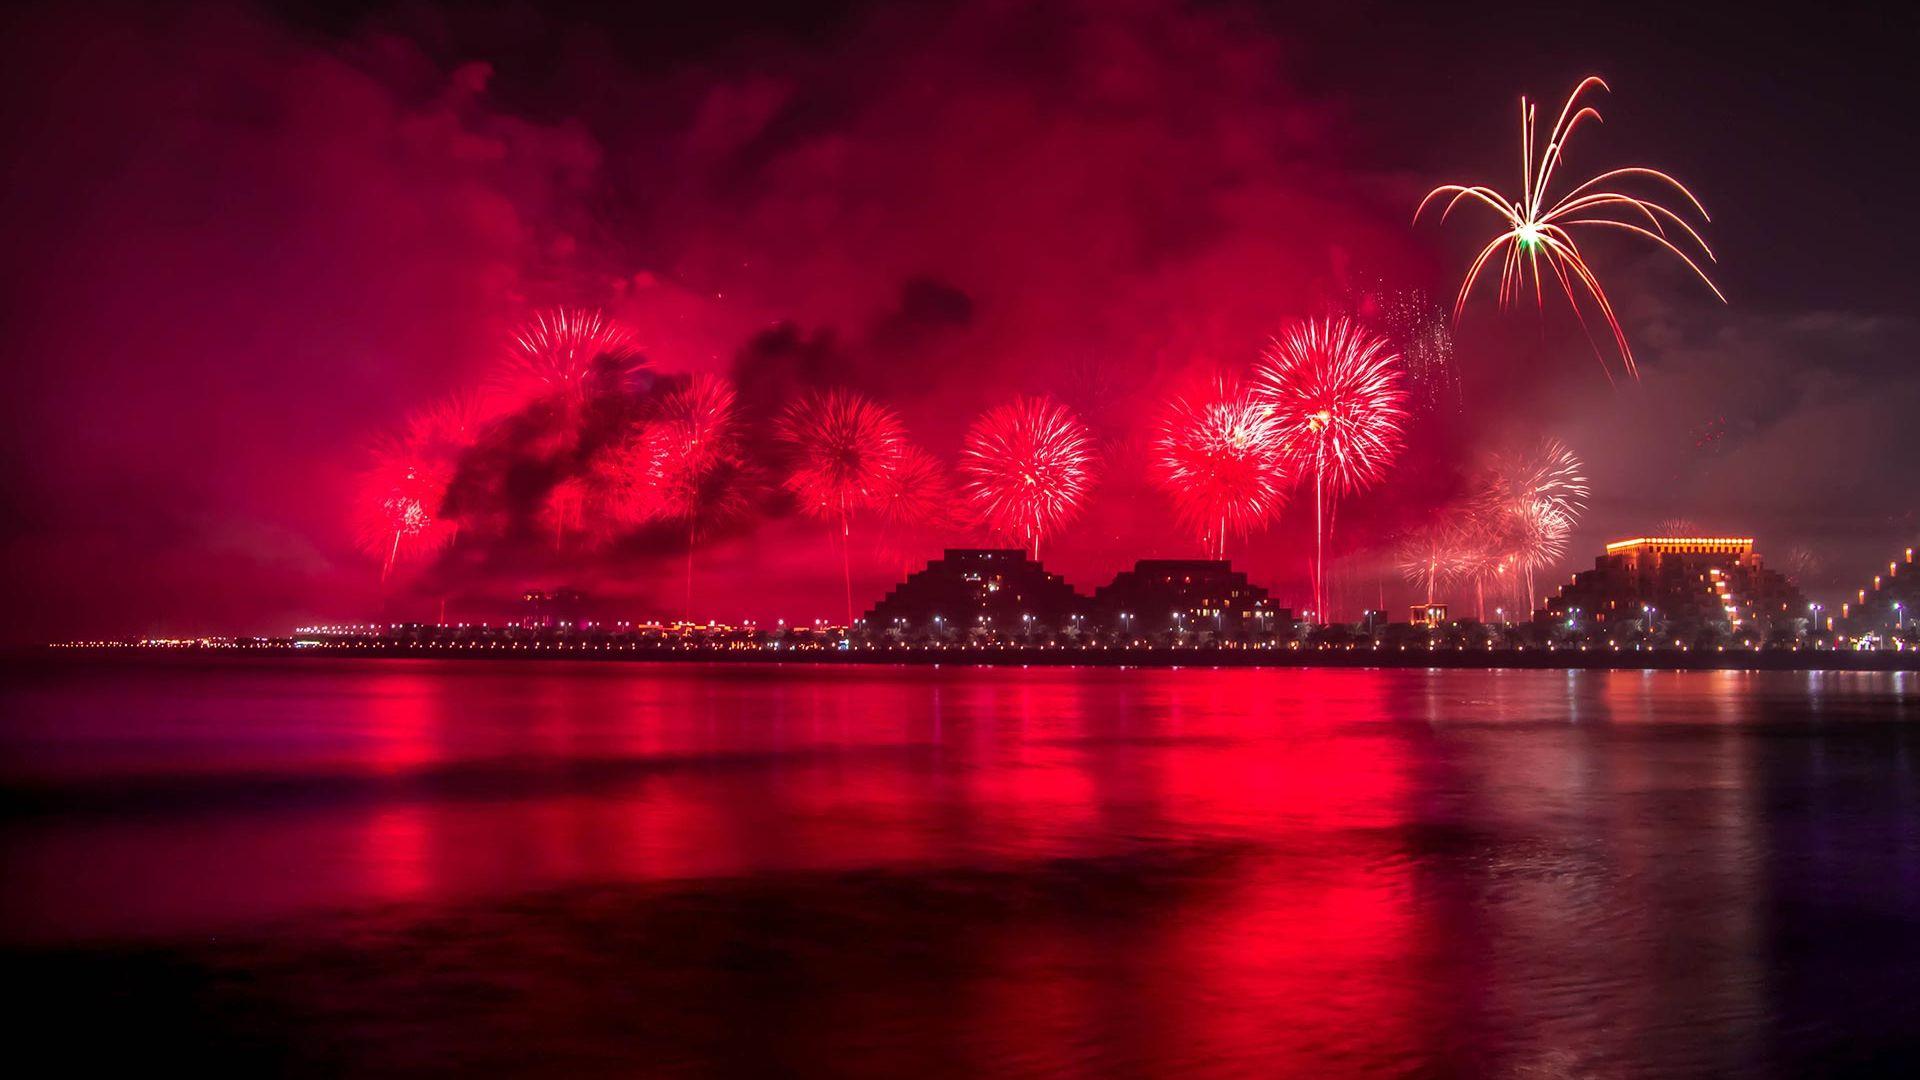 Revelion 2022 - Sejur charter Ras Al Khaimah, EAU, 8 zile